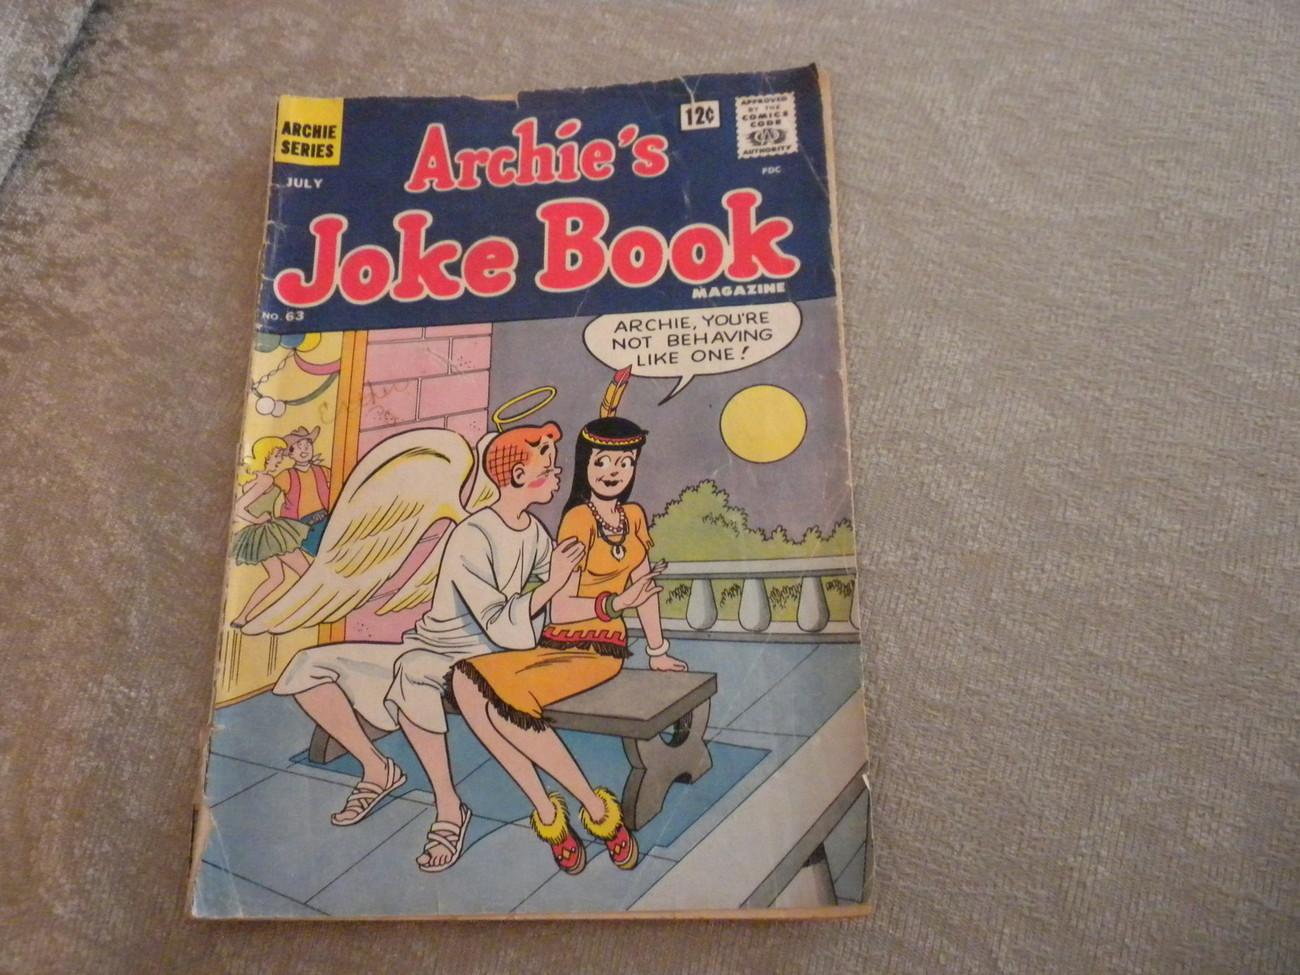 Archie's Joke Book Comic July 1962 VG-   # 63